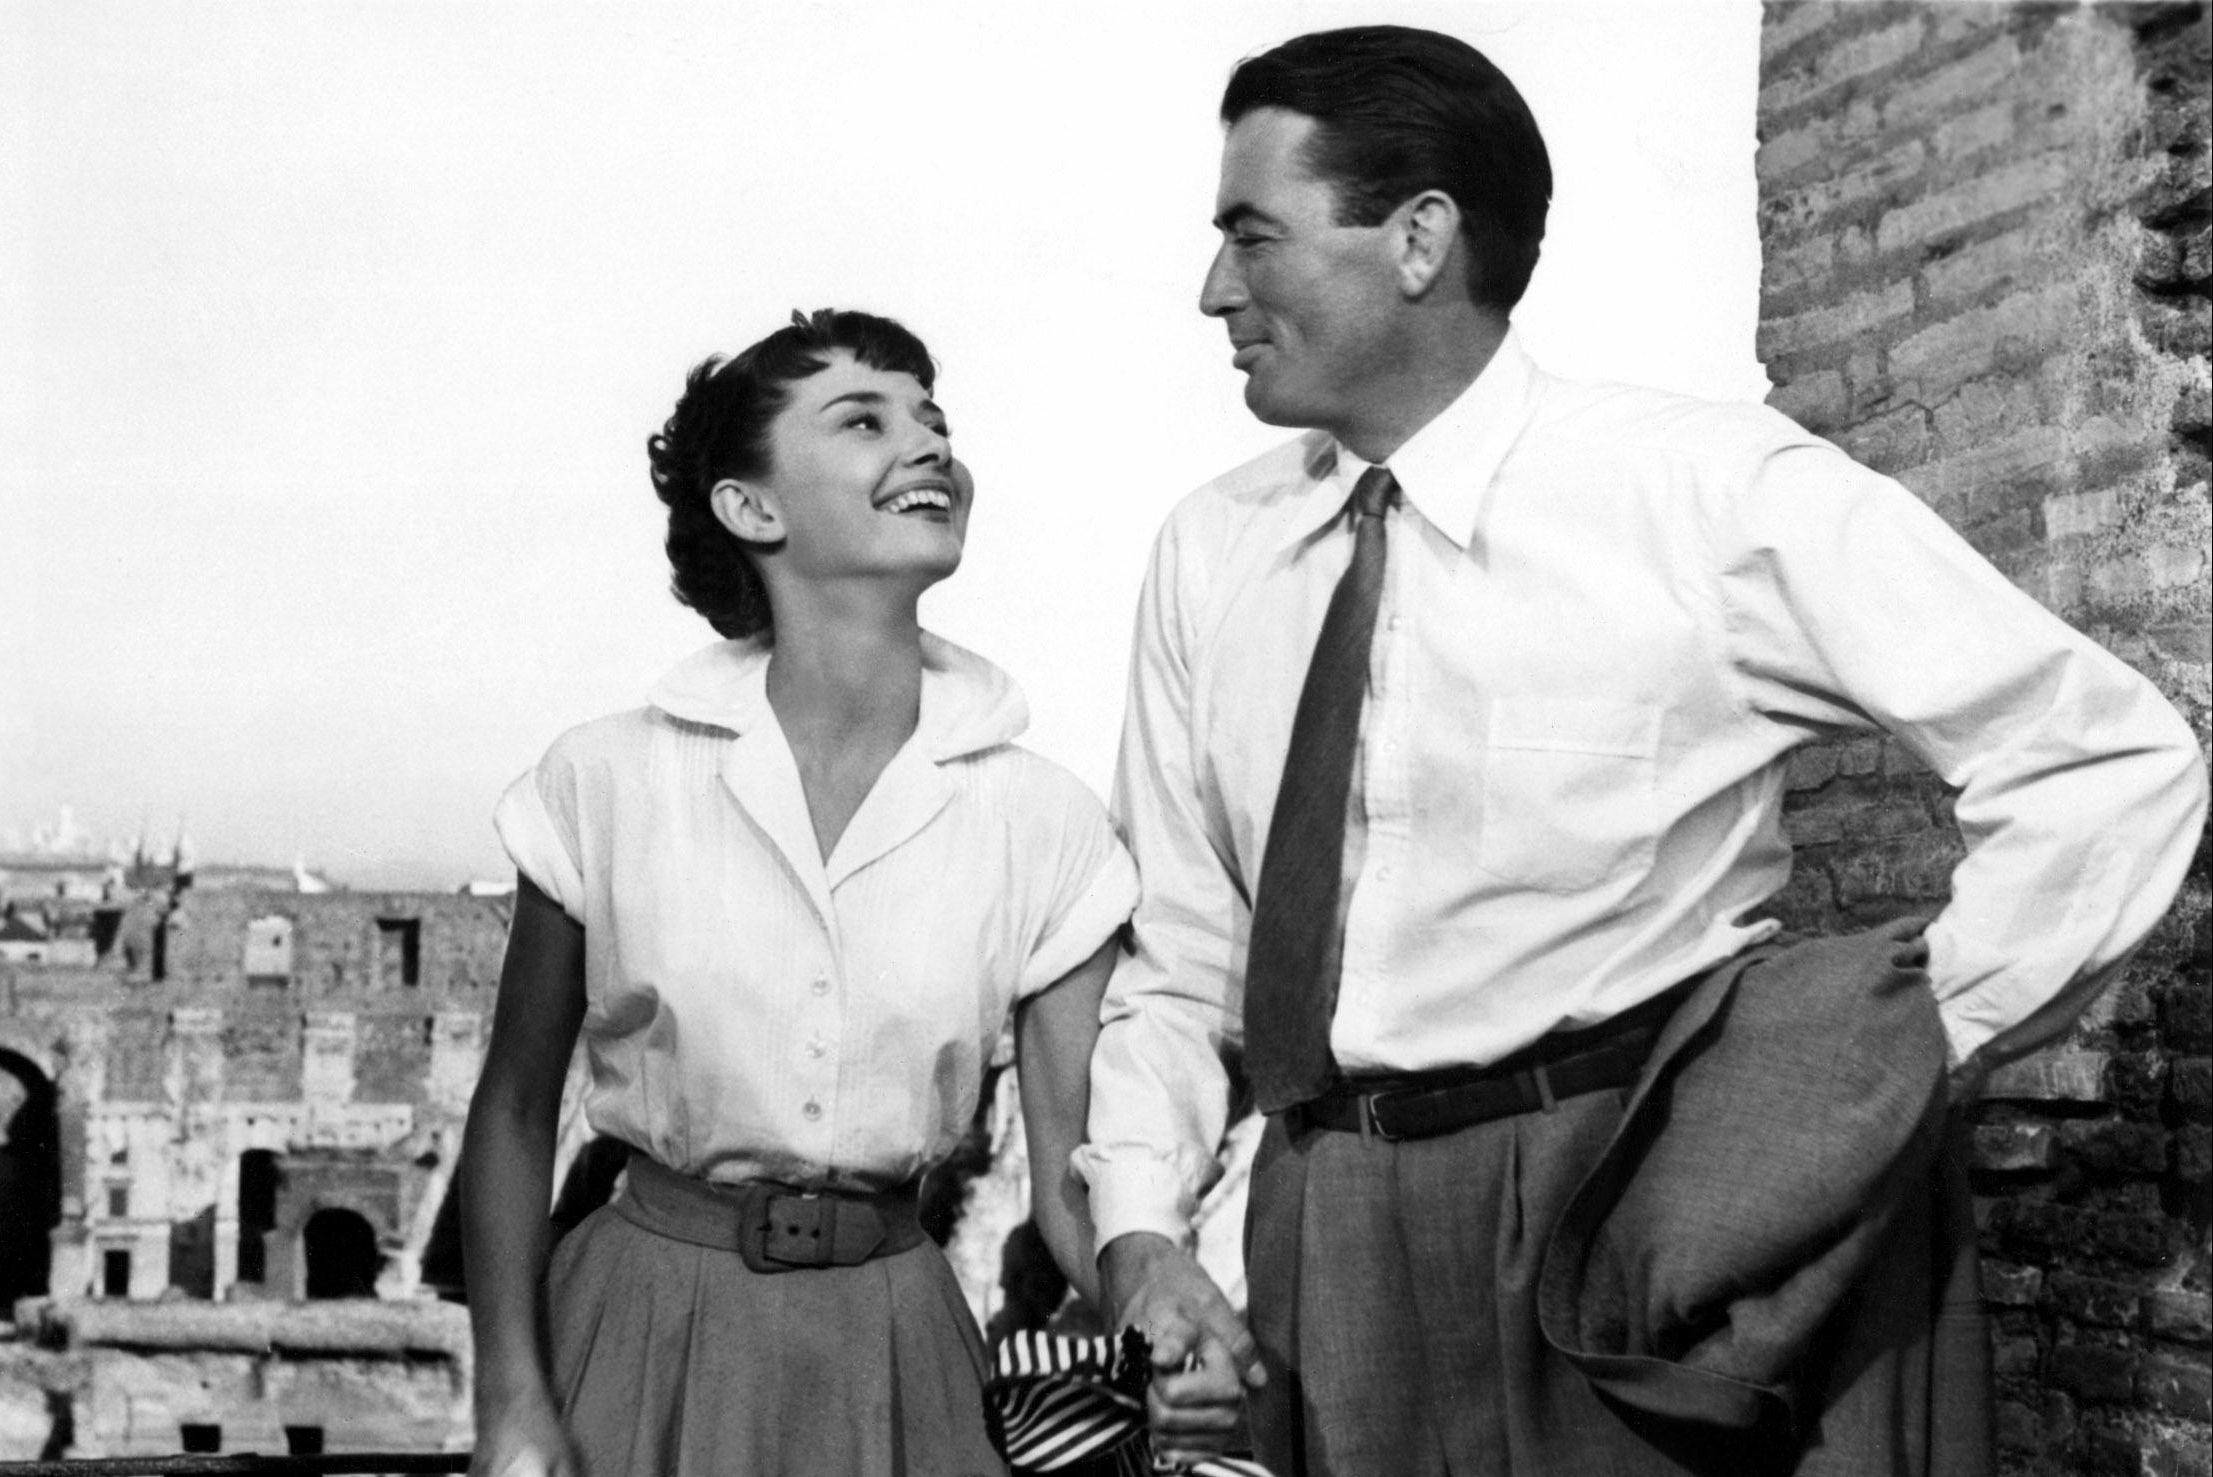 Watch Now Gregory Peck and Audrey Hepburn exploring Rome?